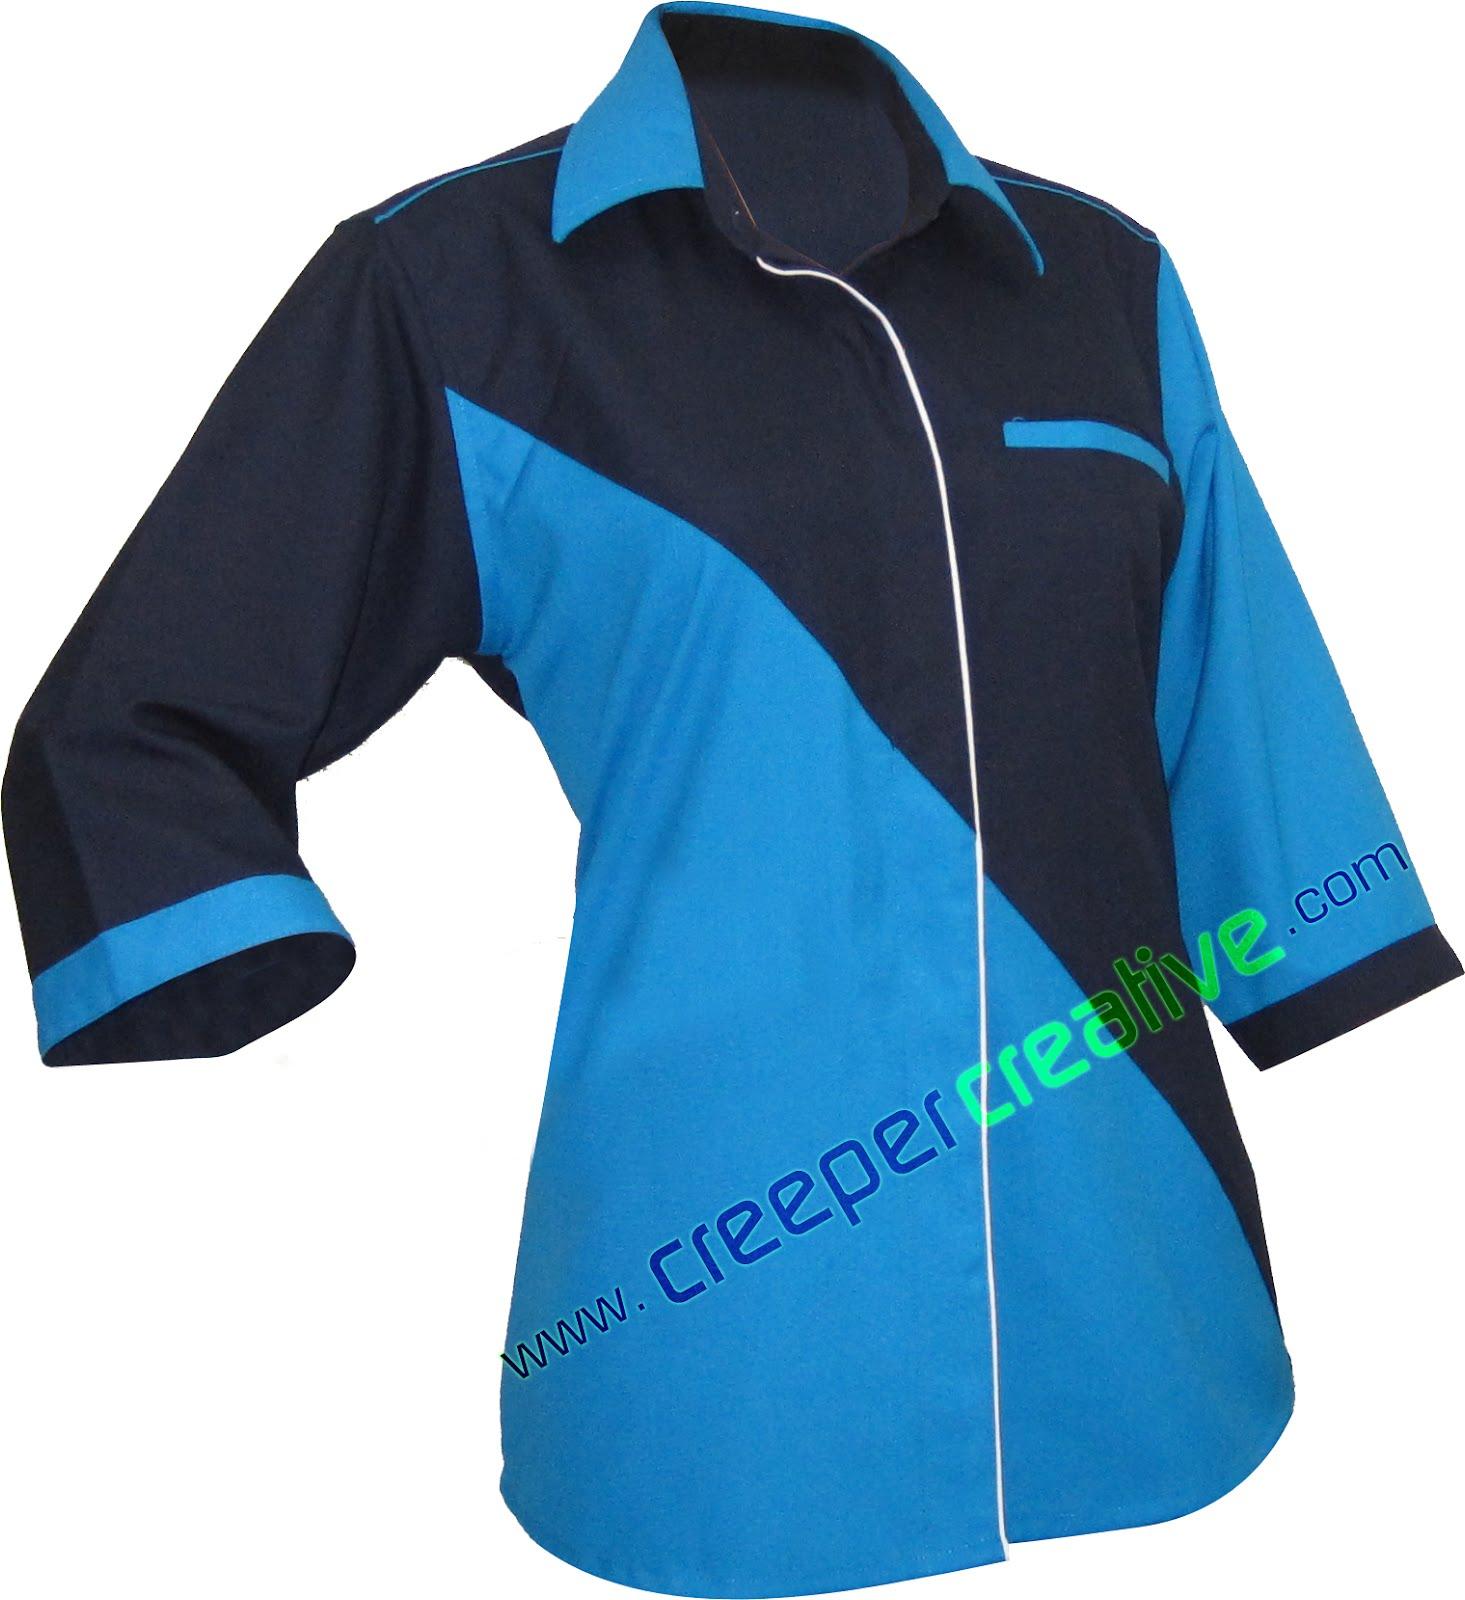 Design t shirt murah - Corporate Shirt Customade Arsenal